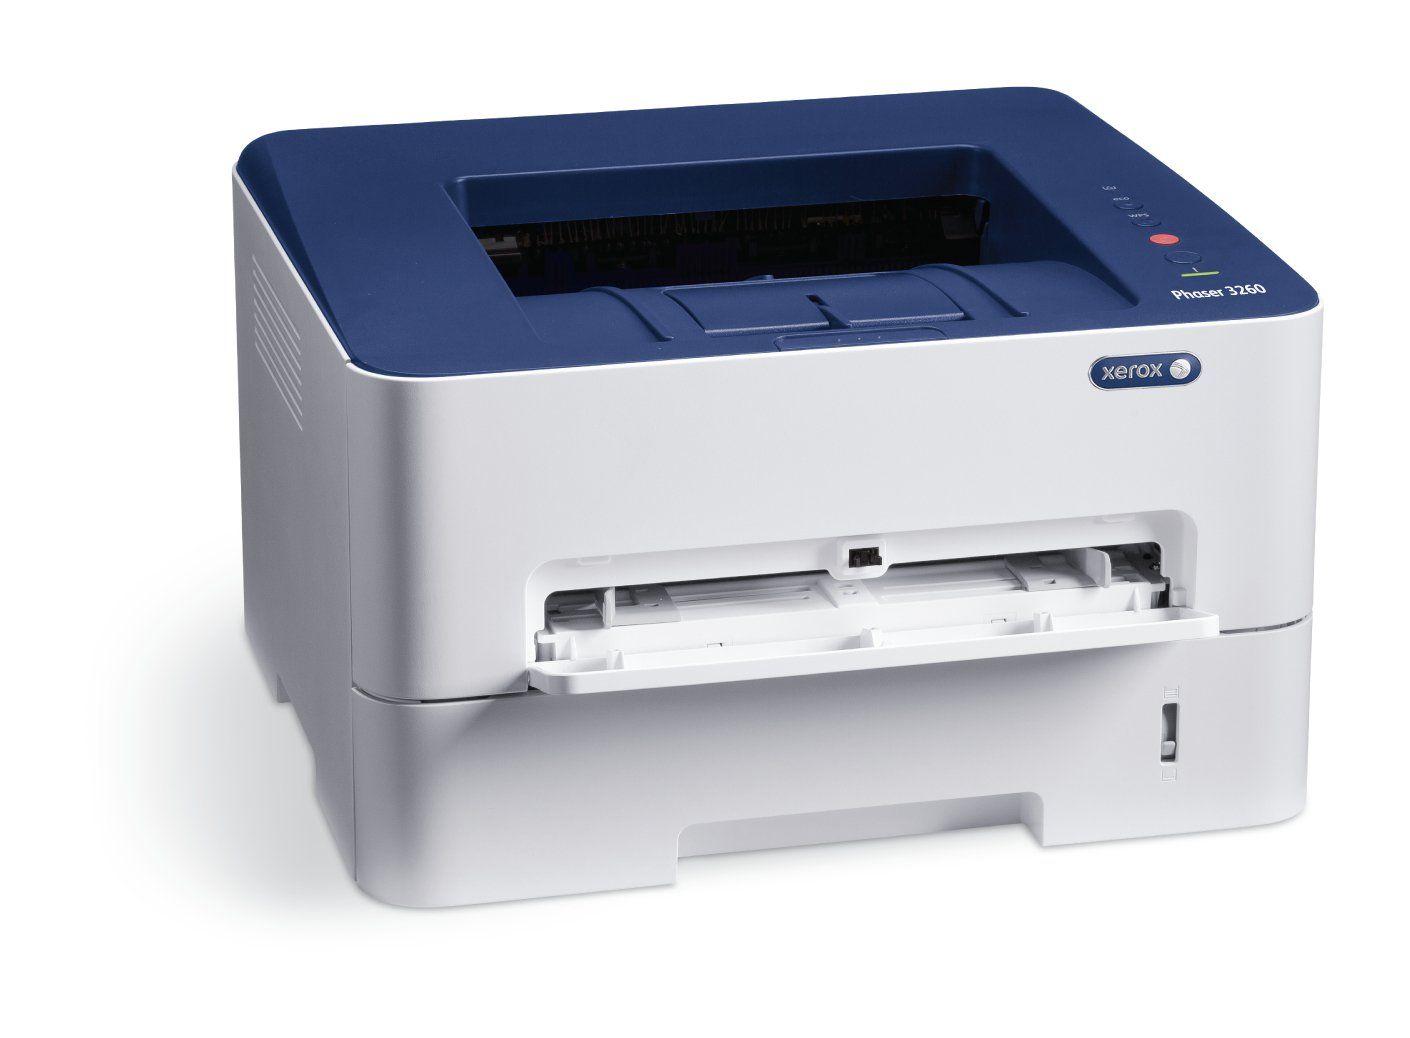 Xerox Phaser 3260/DNI Monchrome Laser Printer Wireless